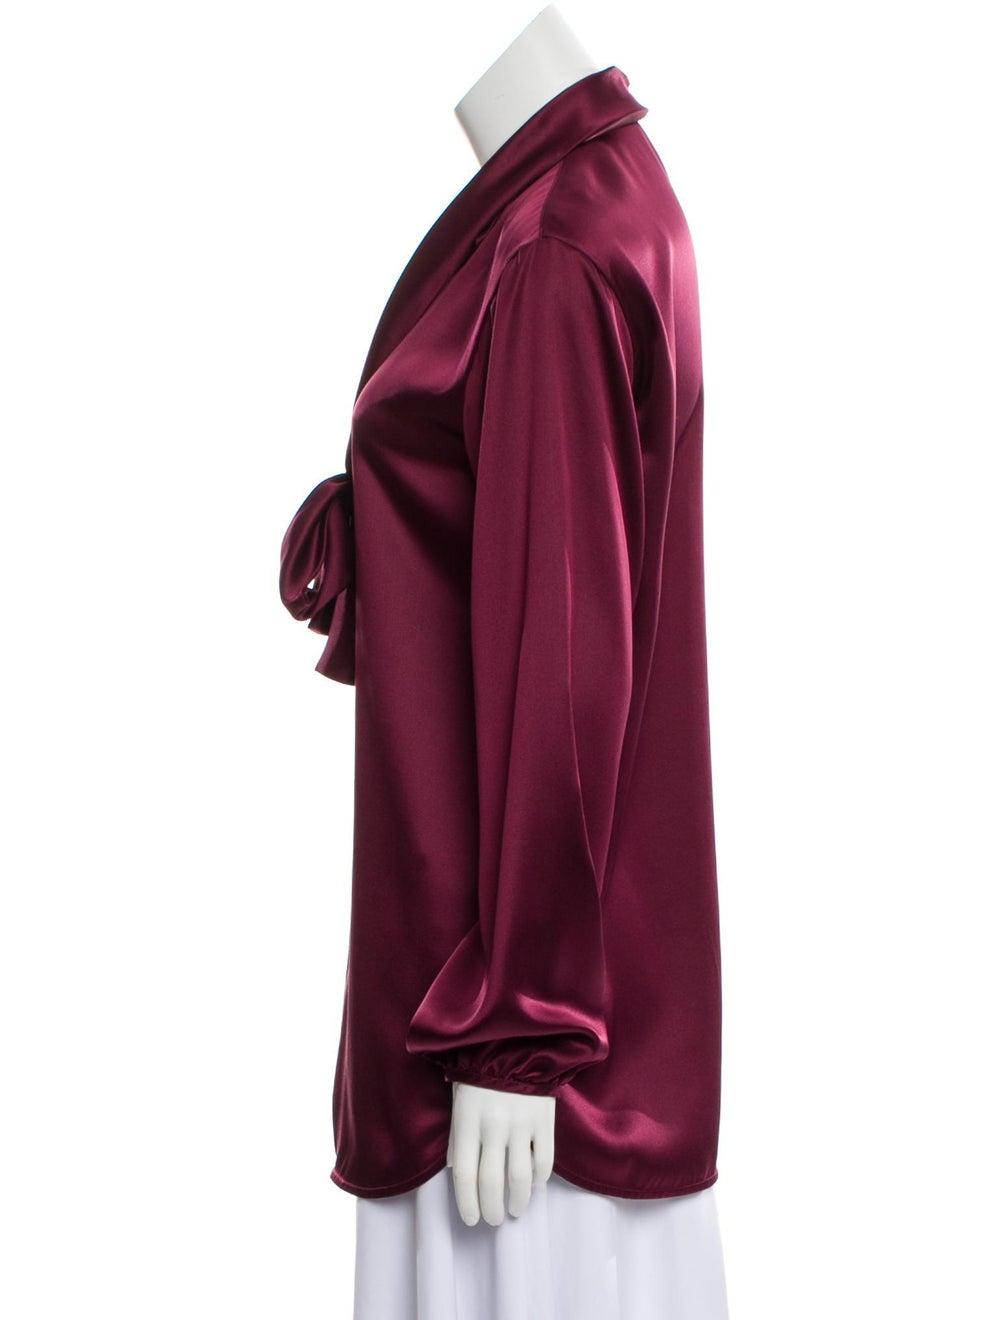 Celine Silk Long Sleeve Blouse - image 2